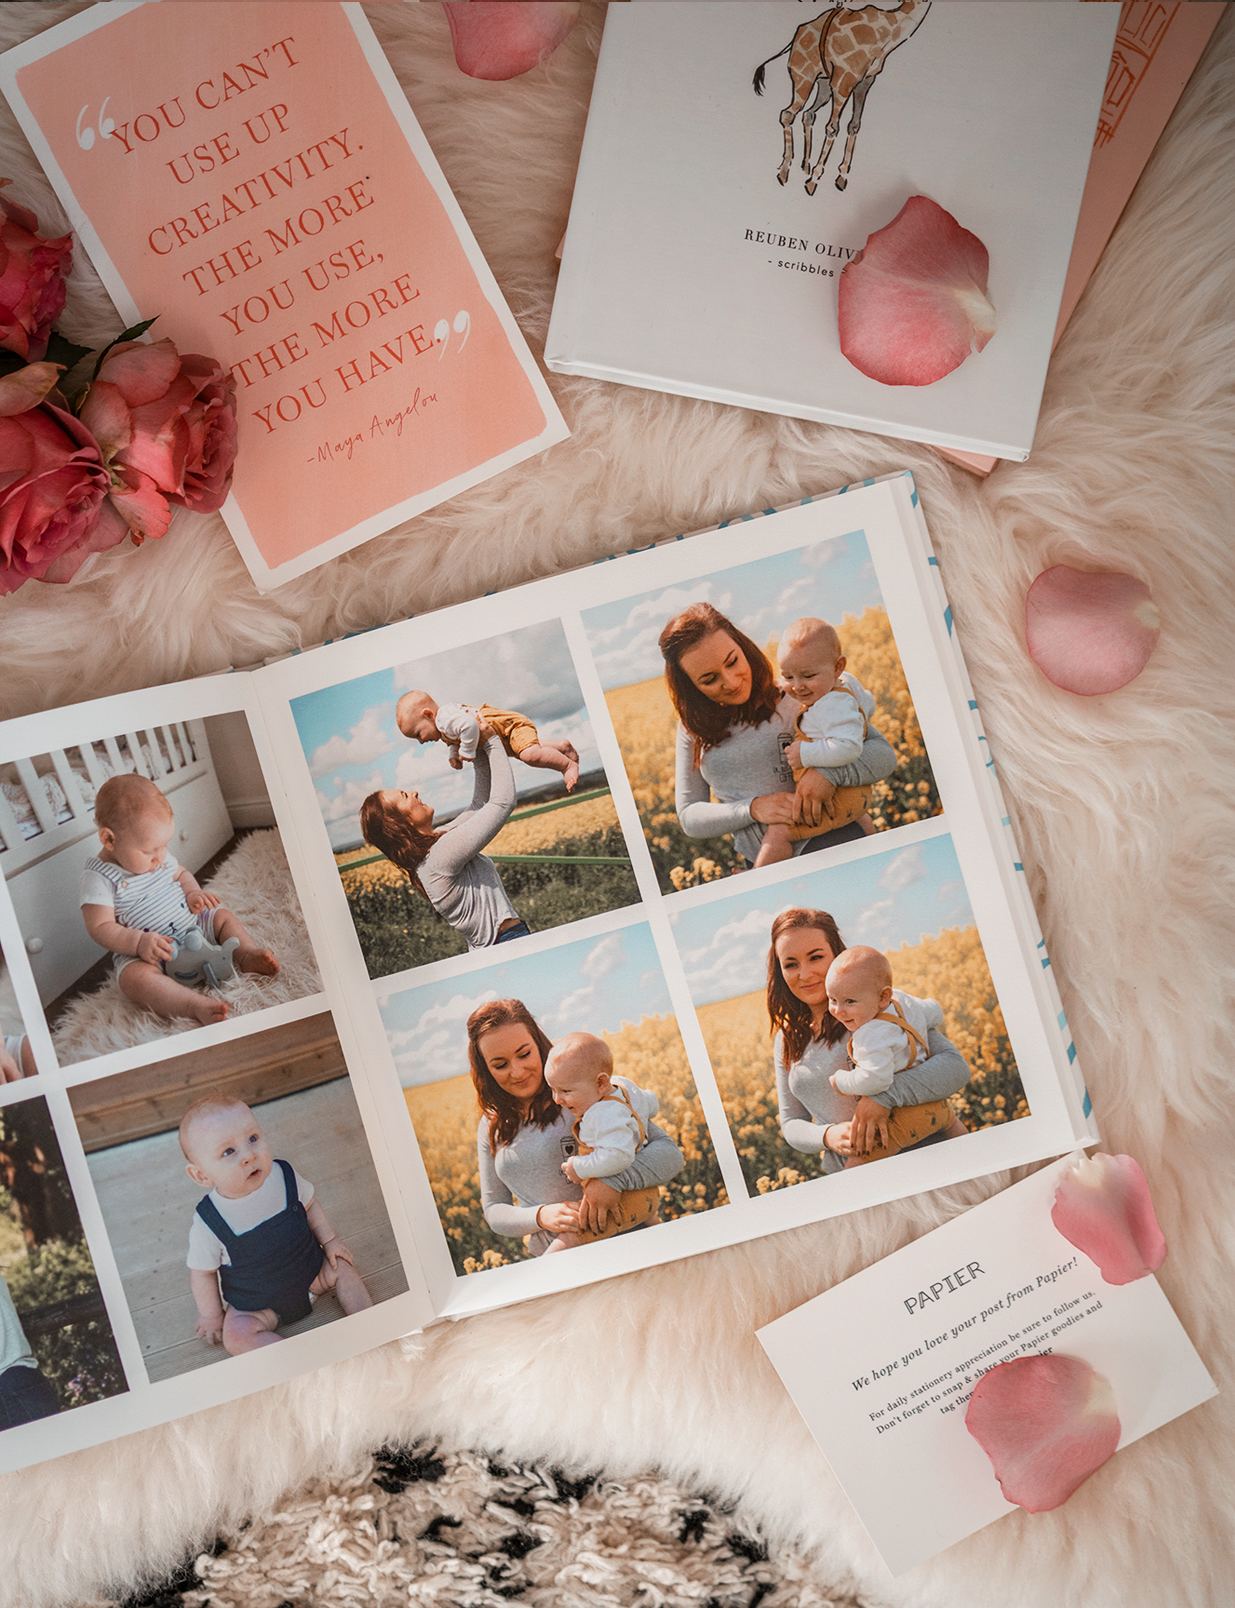 Papier Photo Book Review